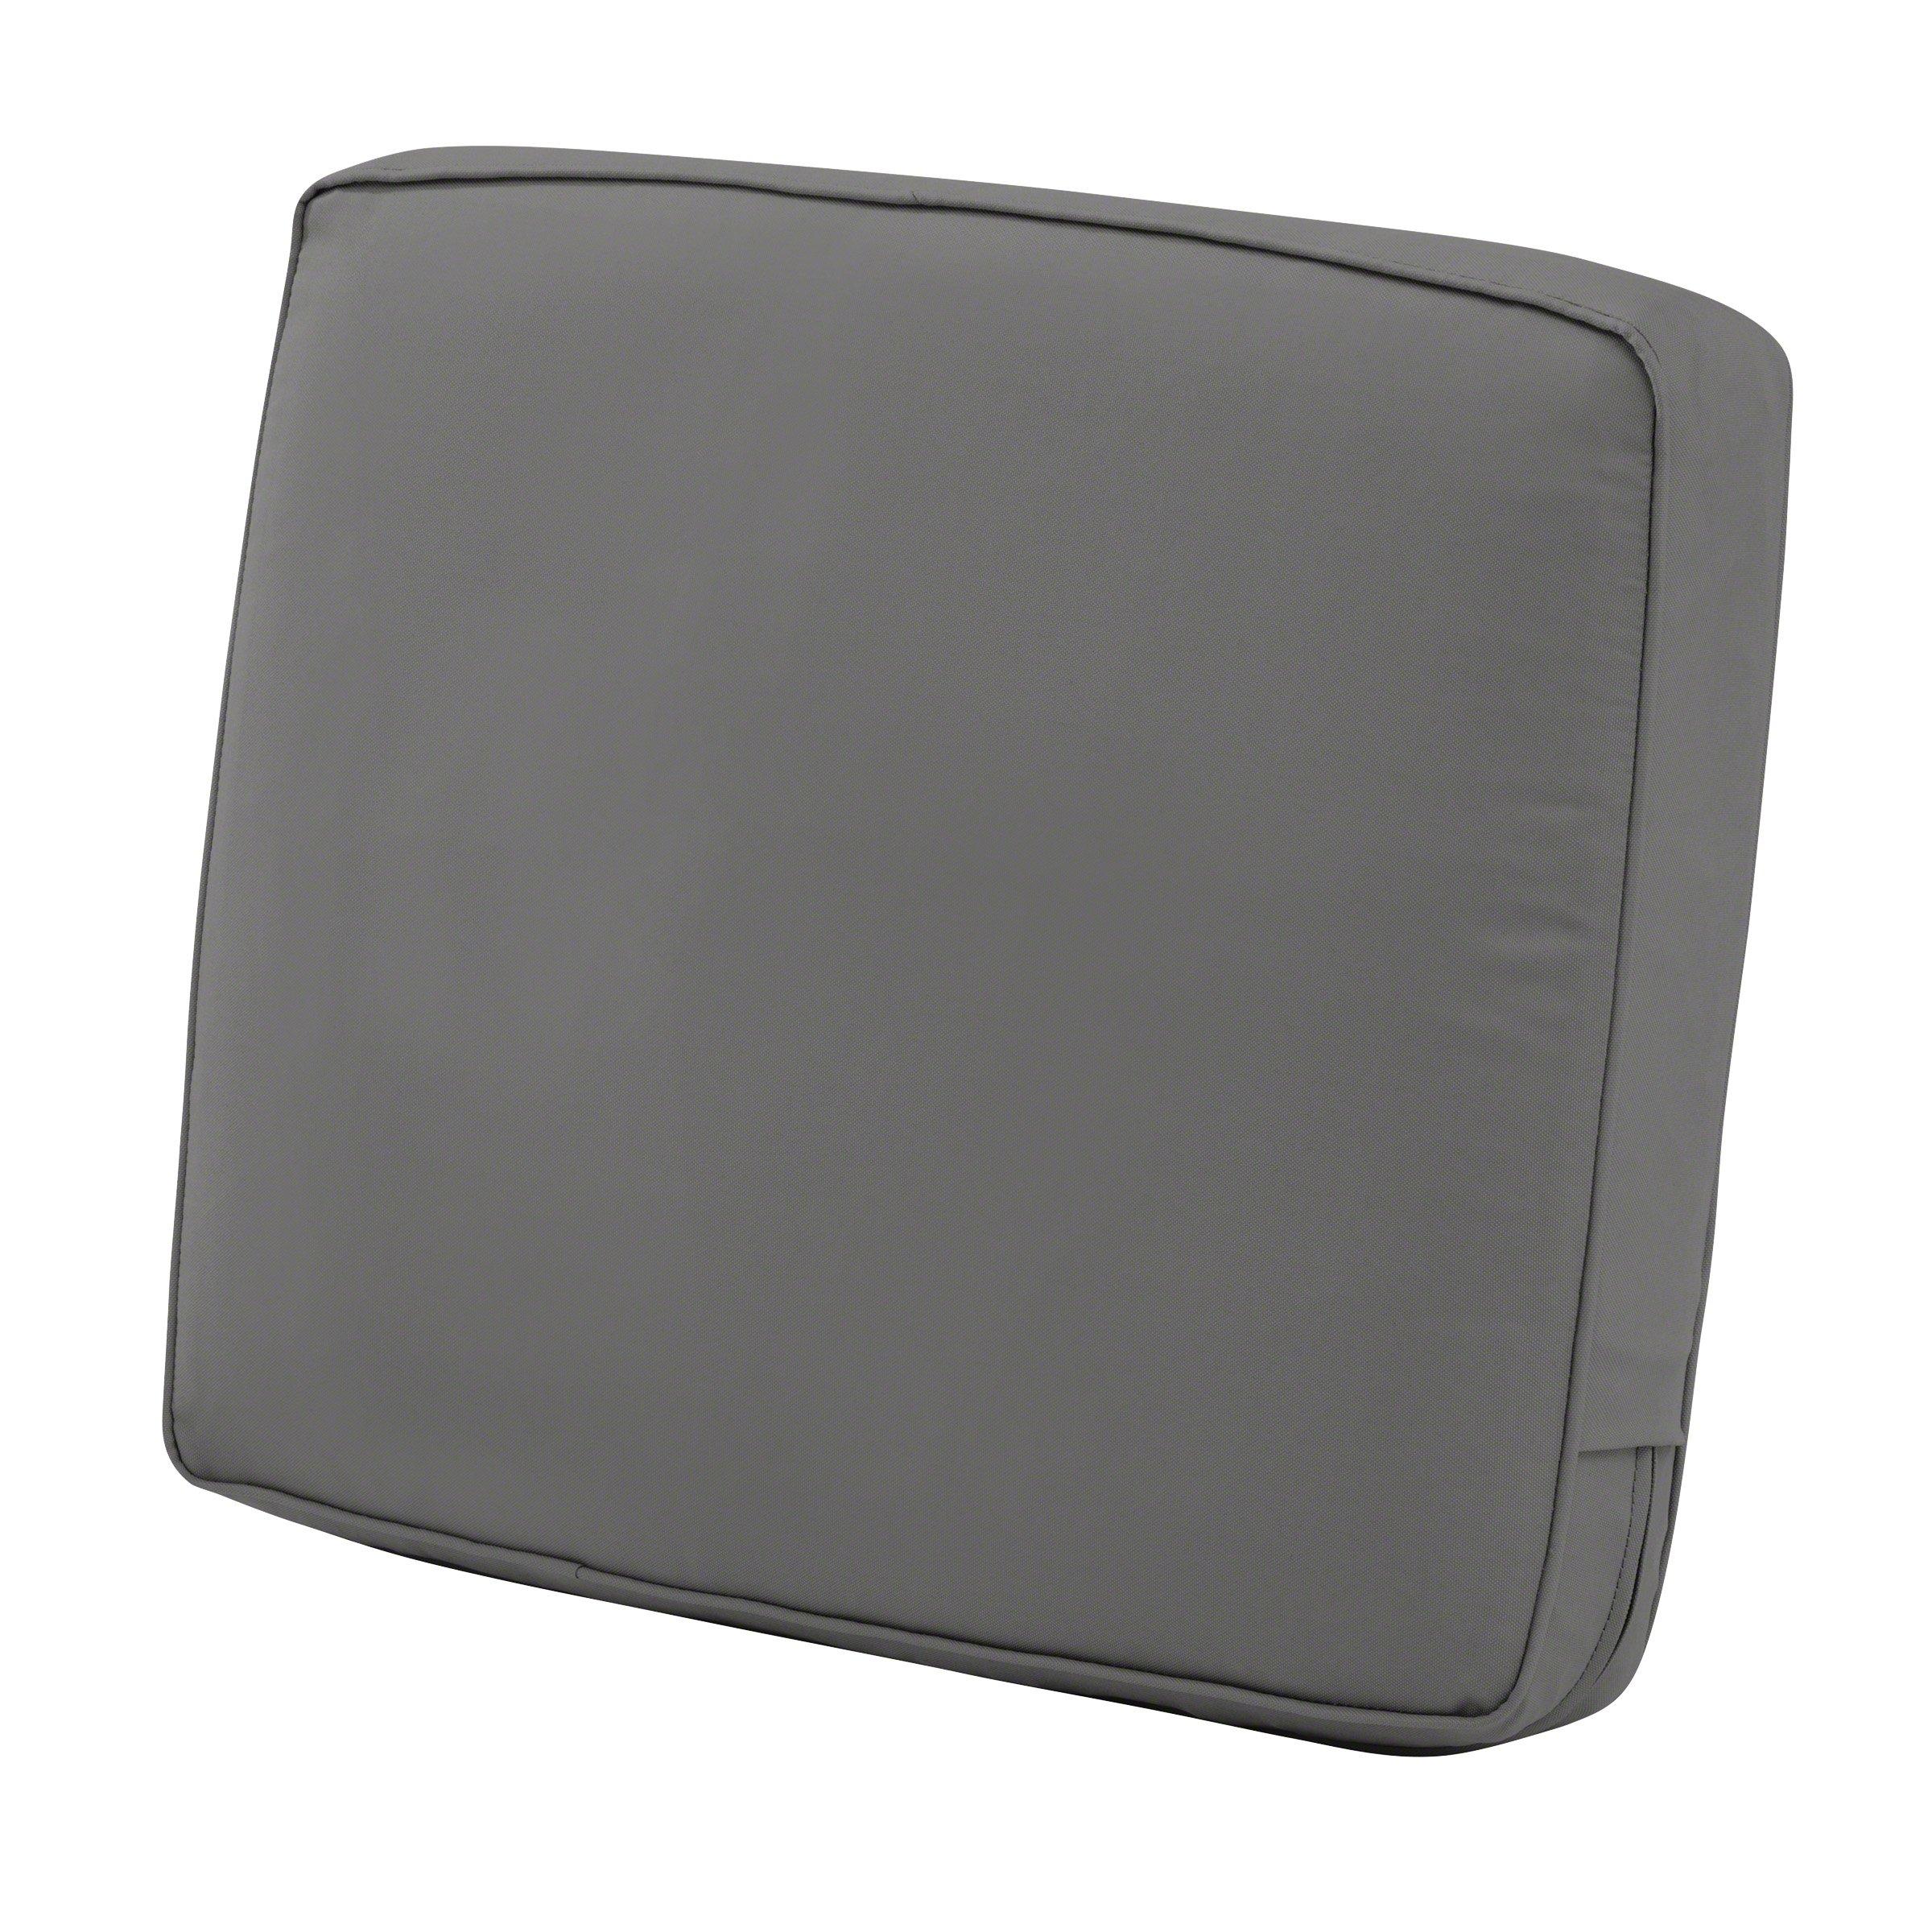 Classic Accessories Montlake Back Cushion Foam & Slip Cover, Light Charcoal, 25x18x4 Thick